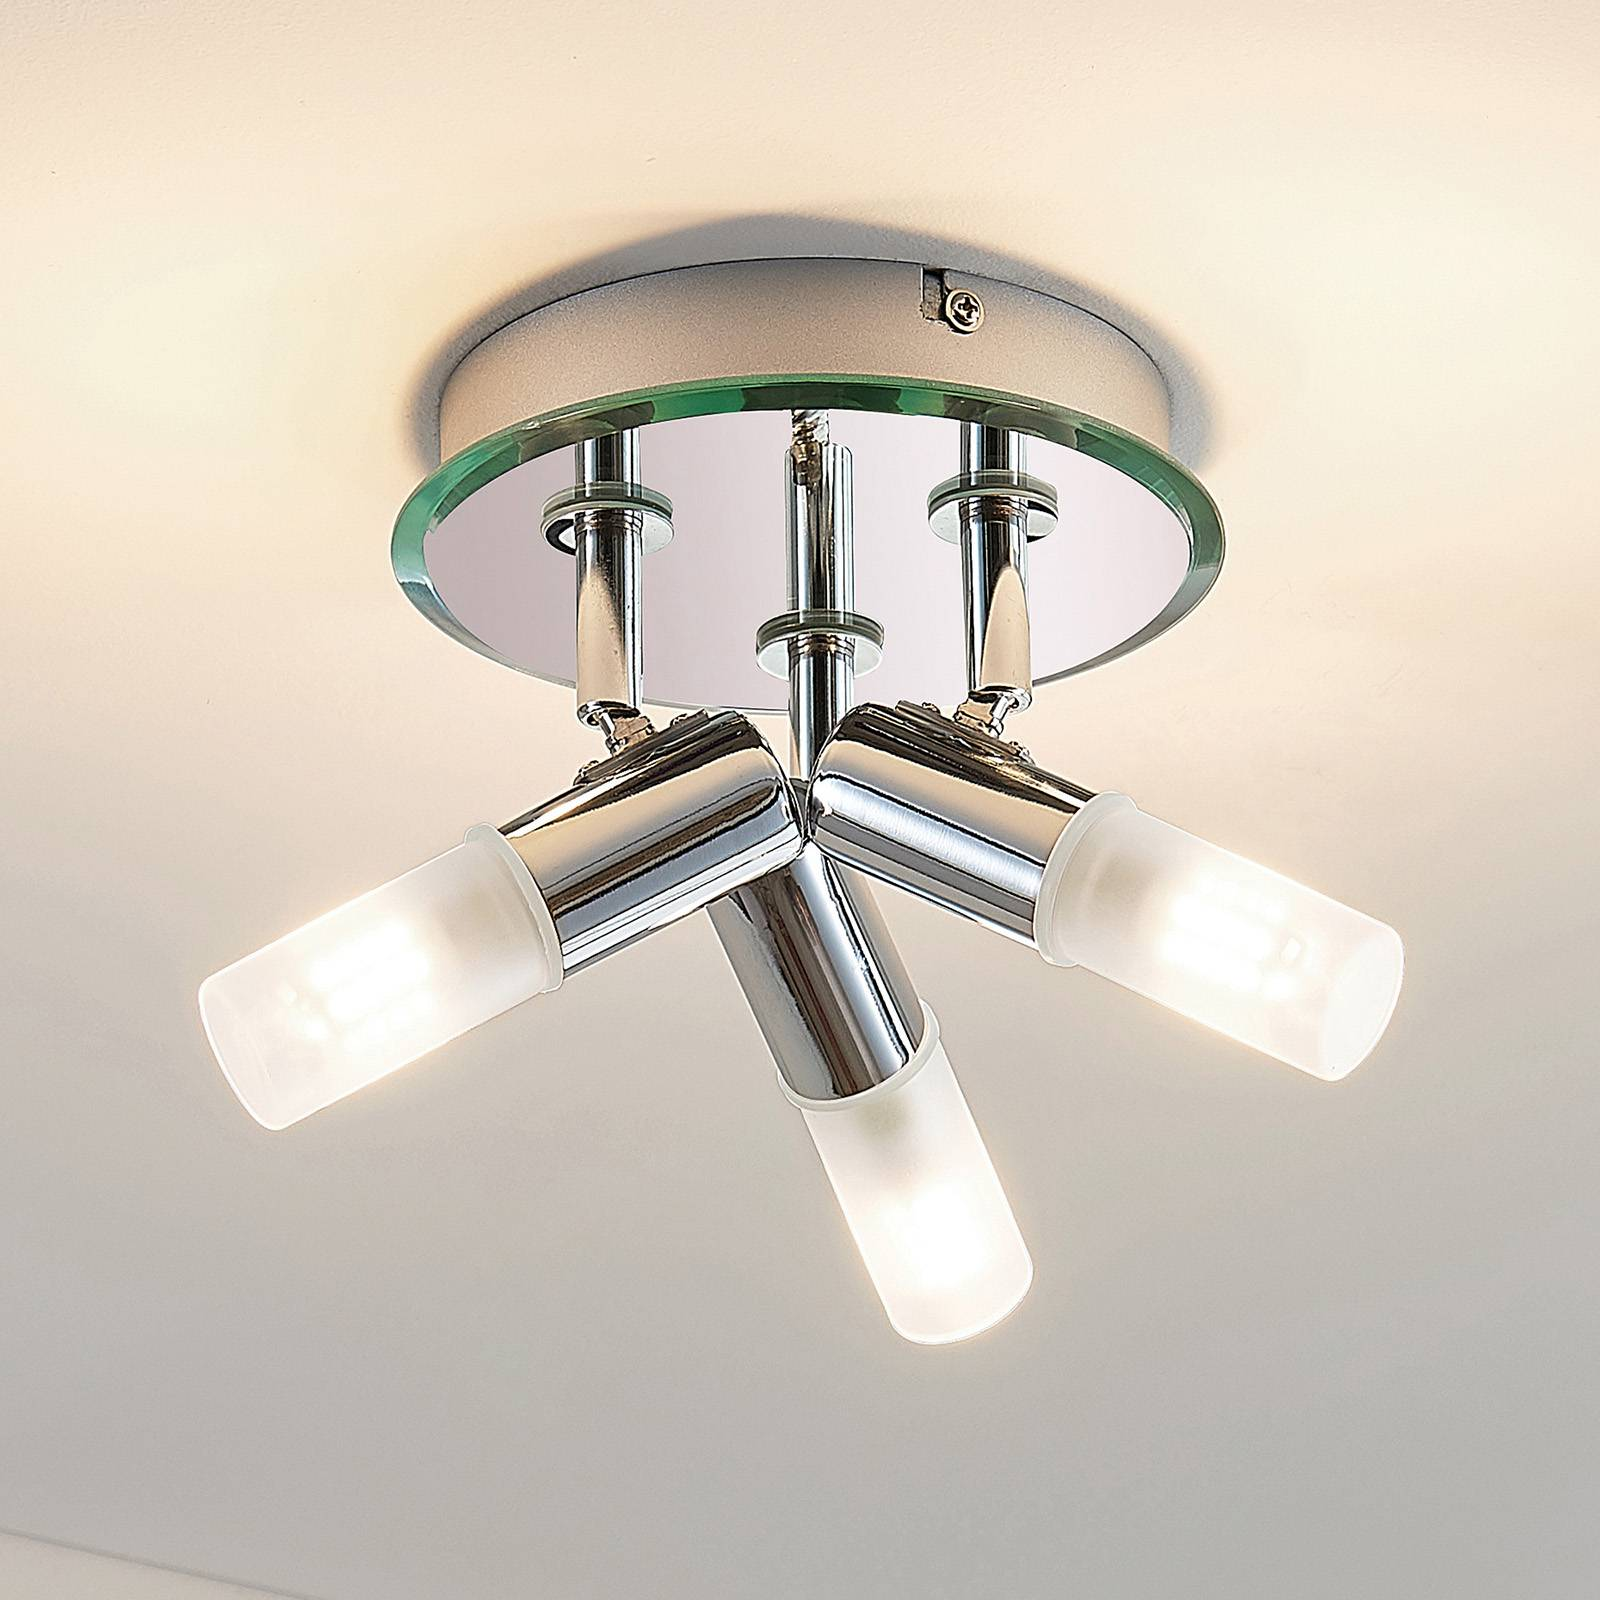 Badkamer plafondlamp Zela, met 3 lampjes in chroom